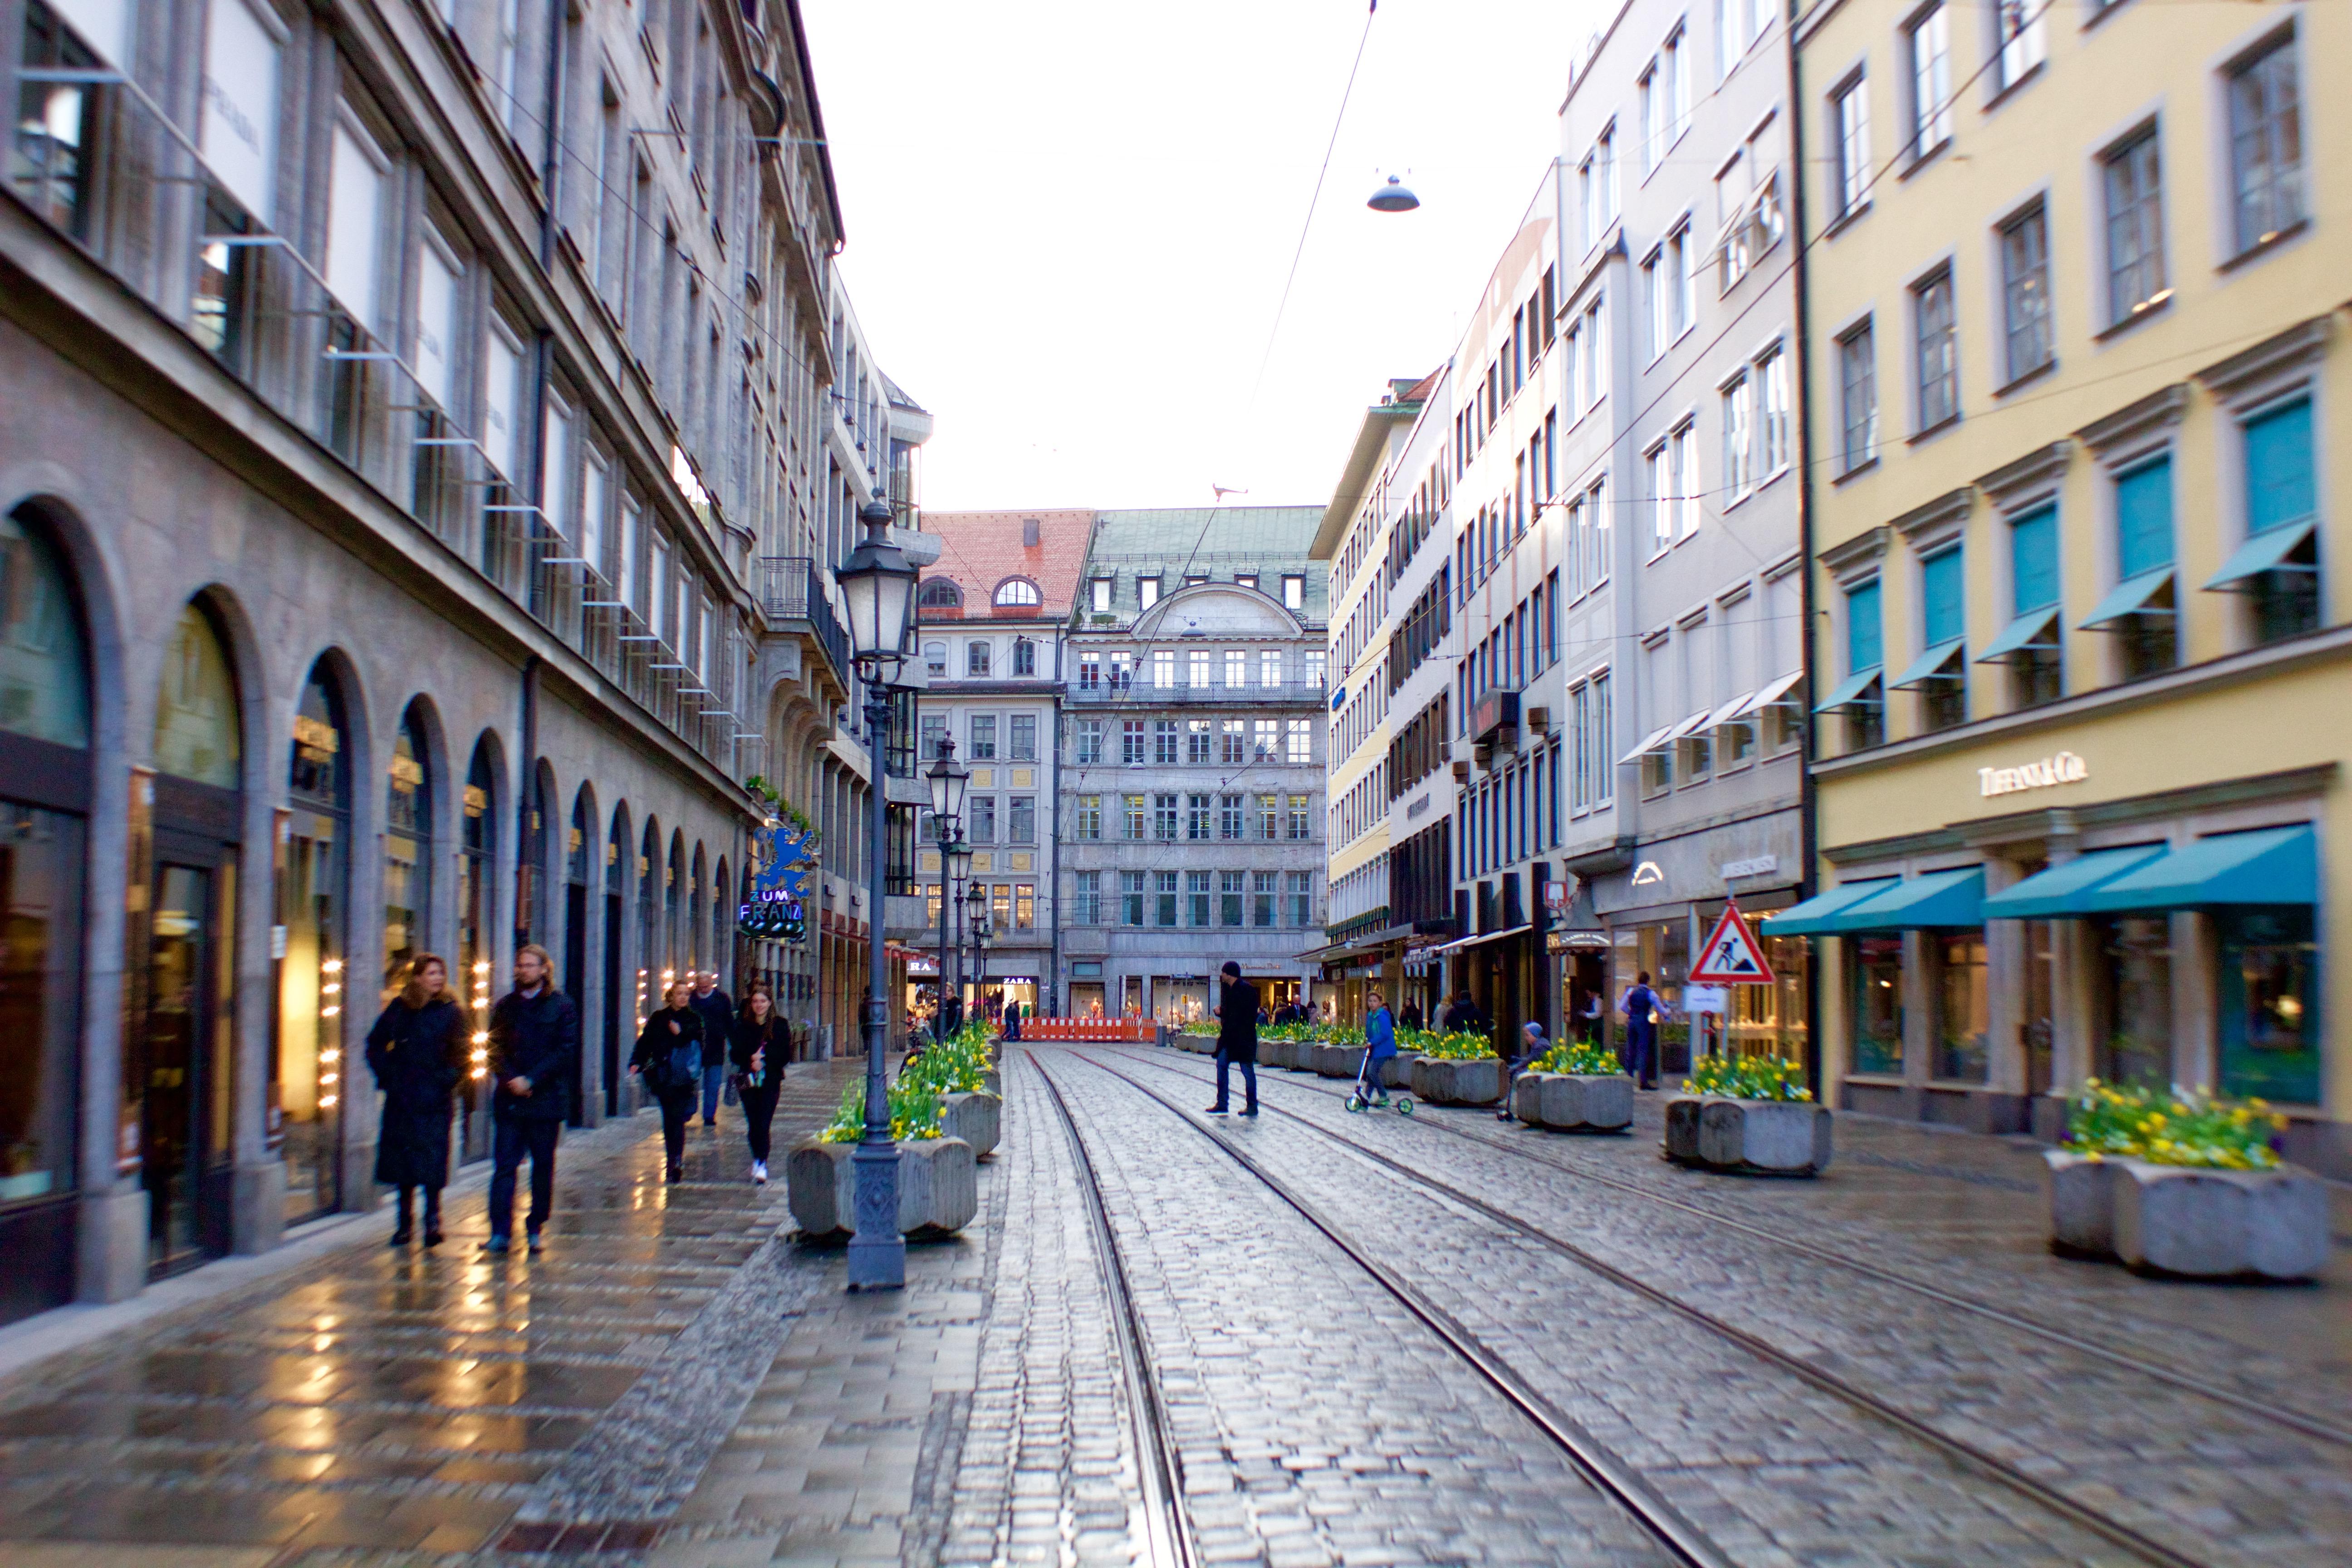 Near Marienplatz